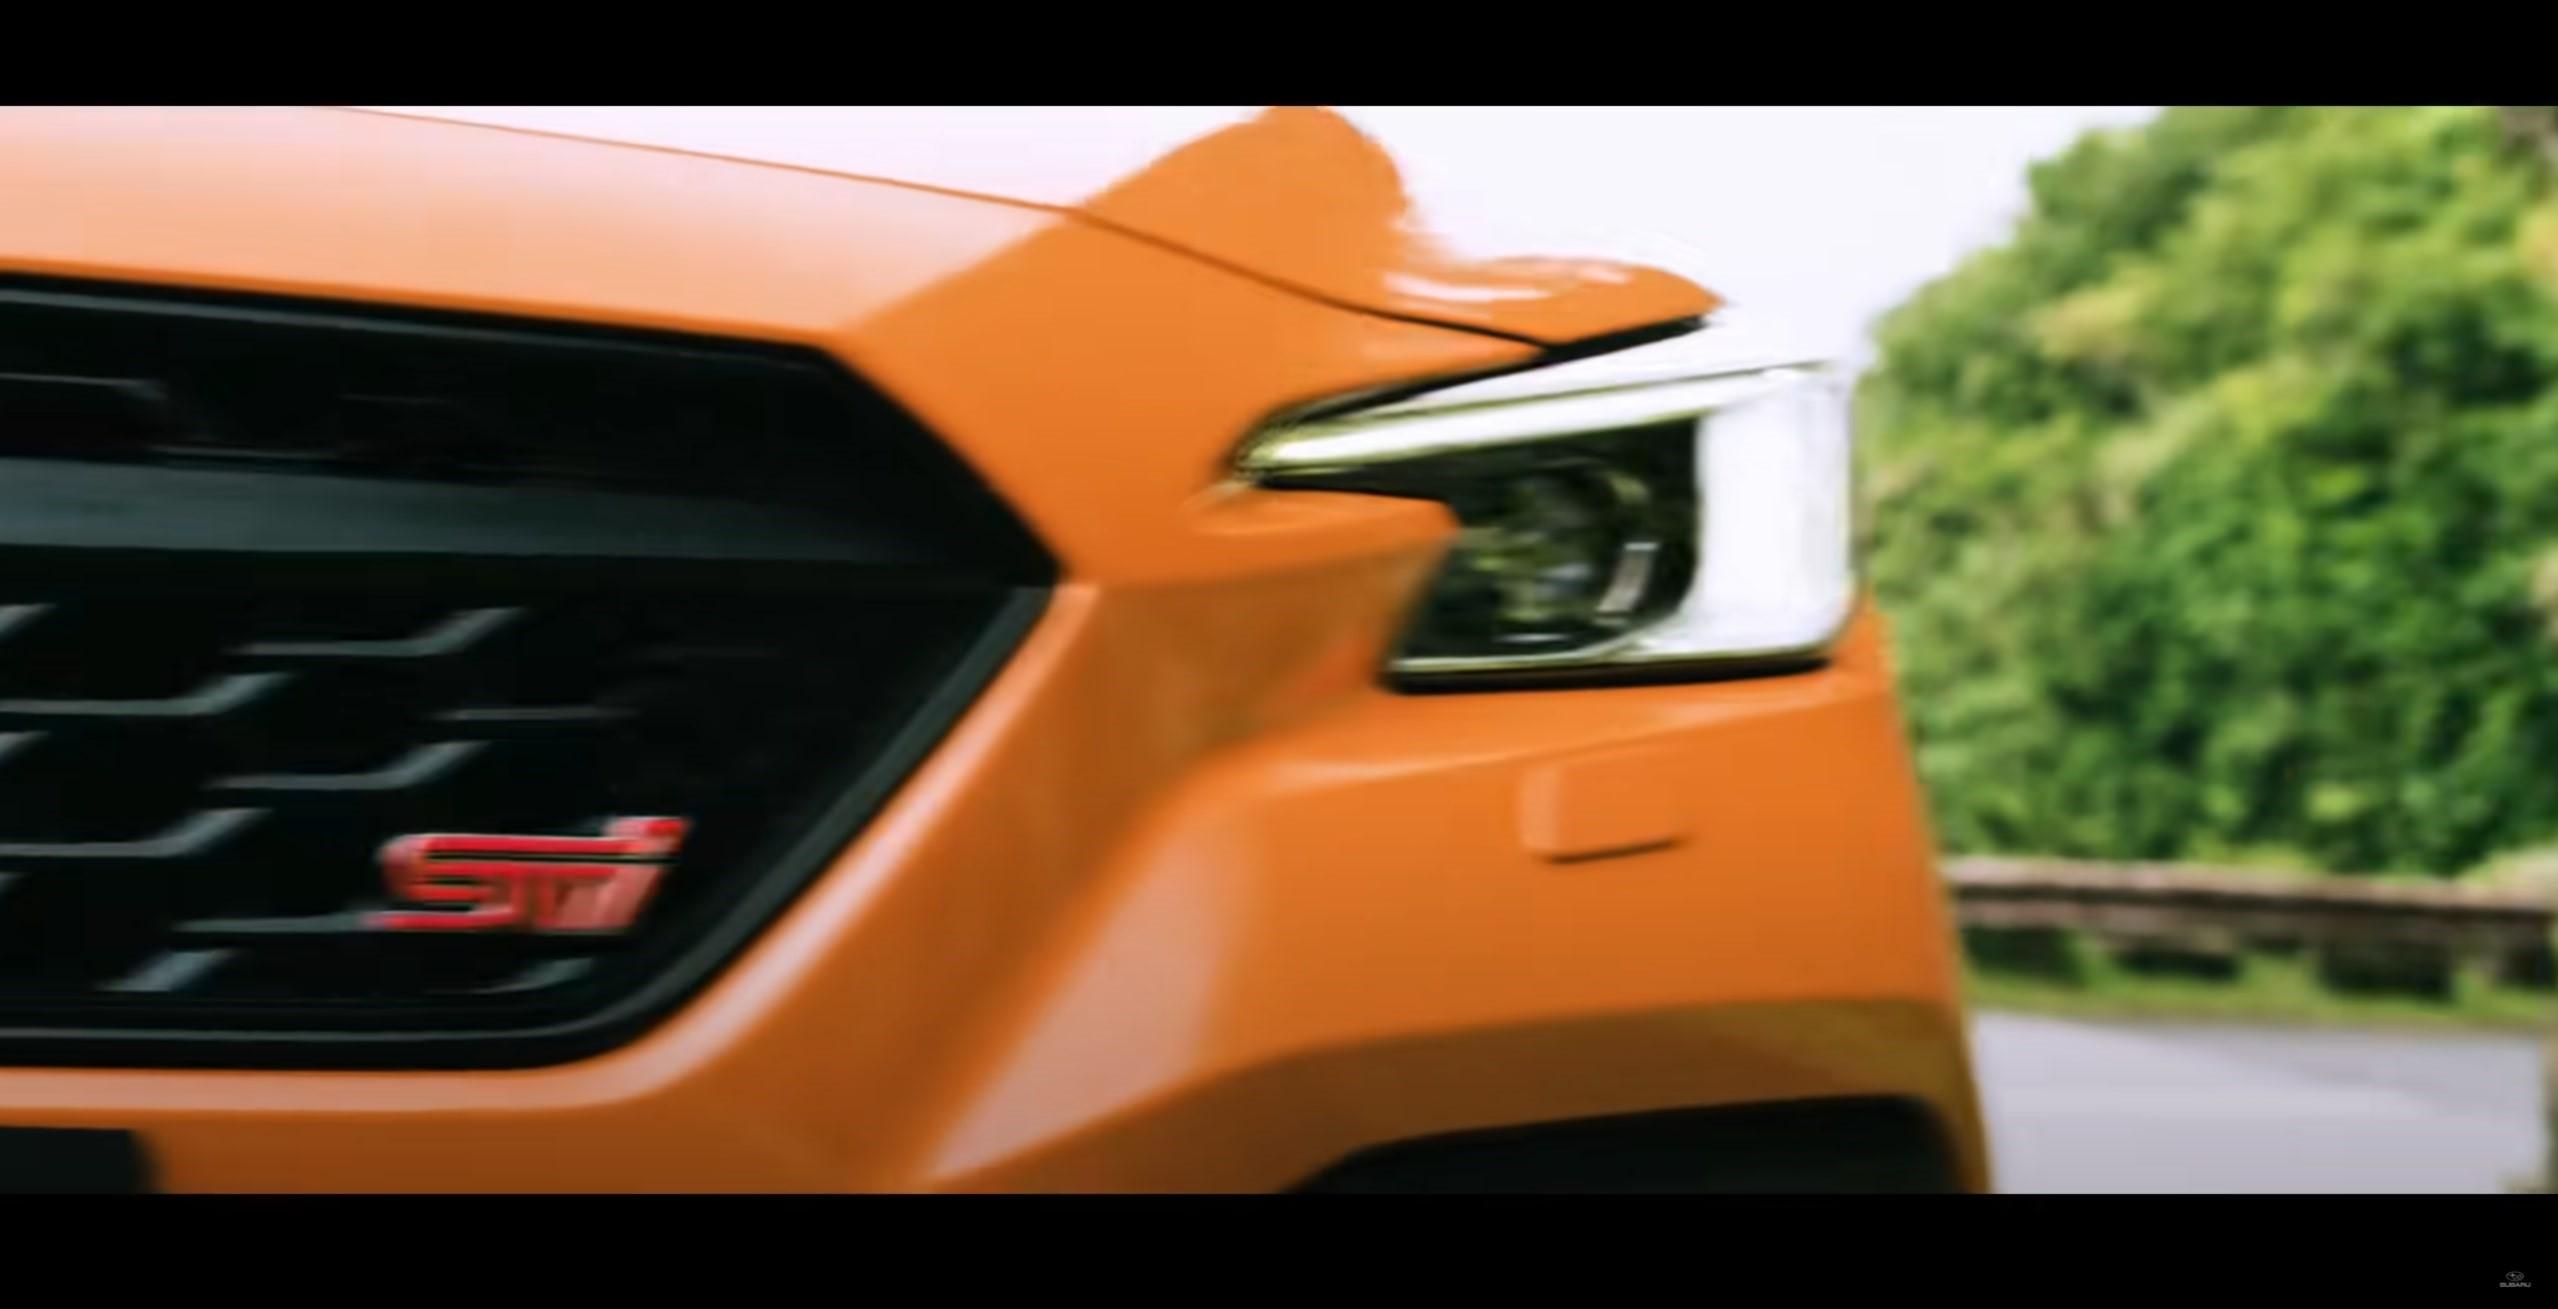 The front grille of the orange 2022 Subaru WRX STI S4